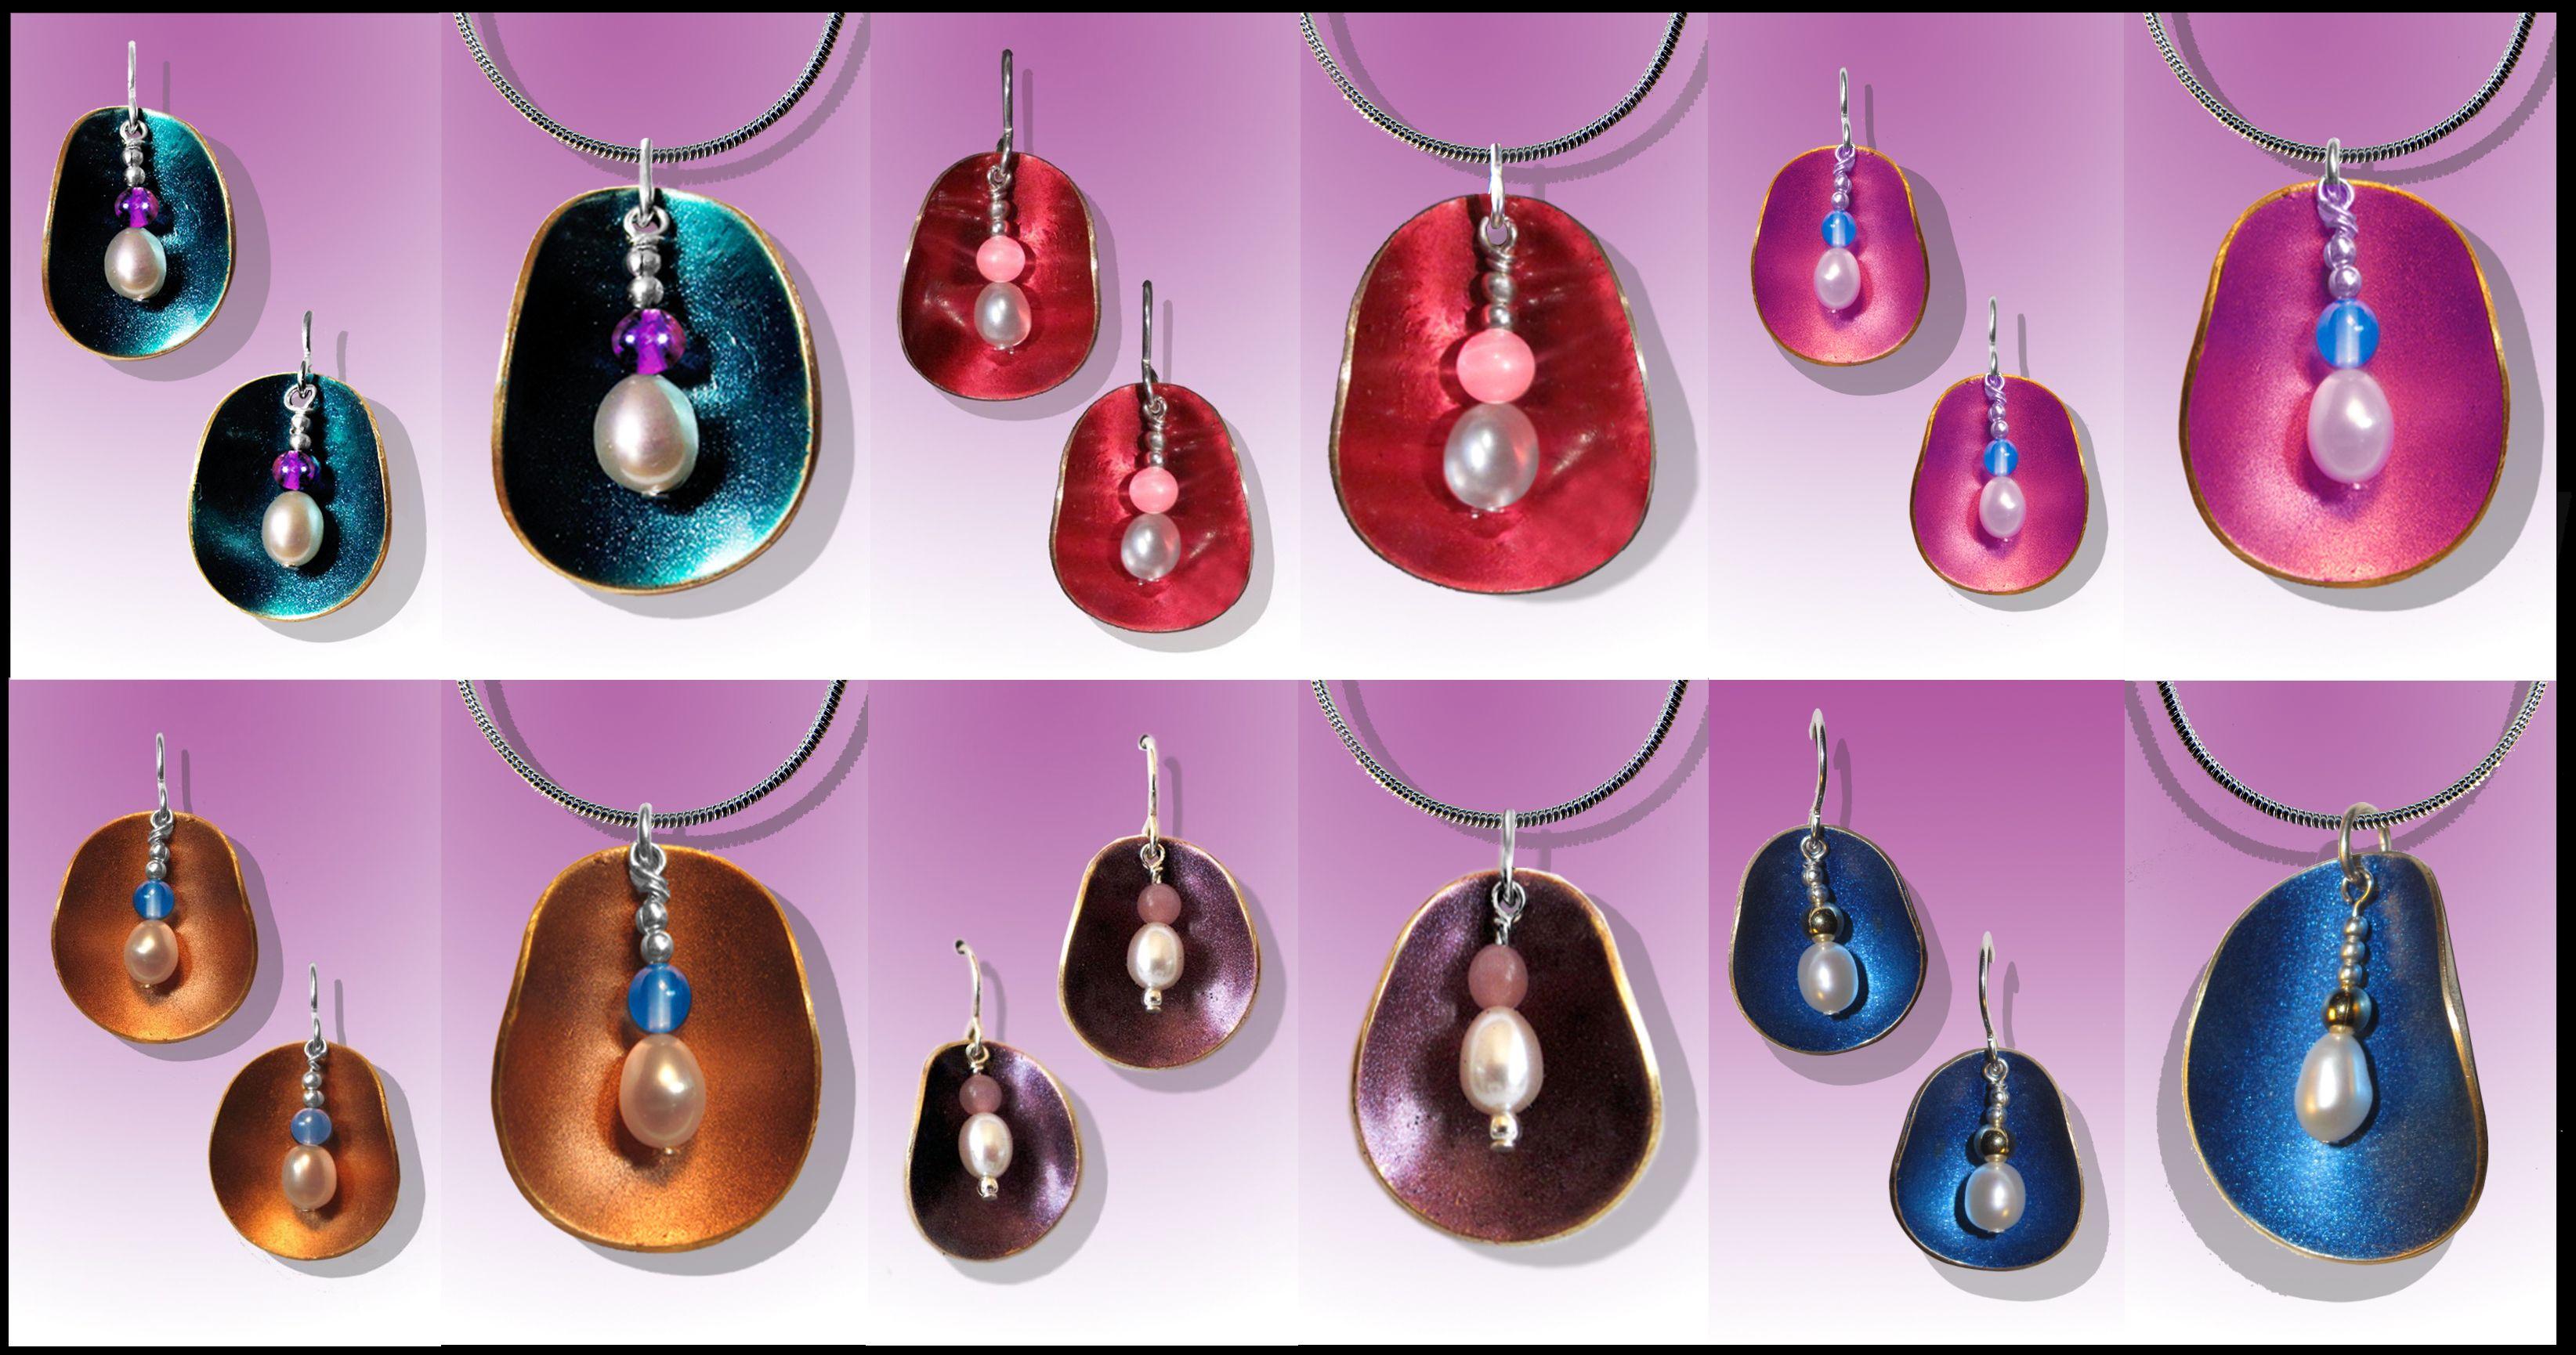 Half Shell earrings and pendants by Scott Lesh (www.LeDanse.com)